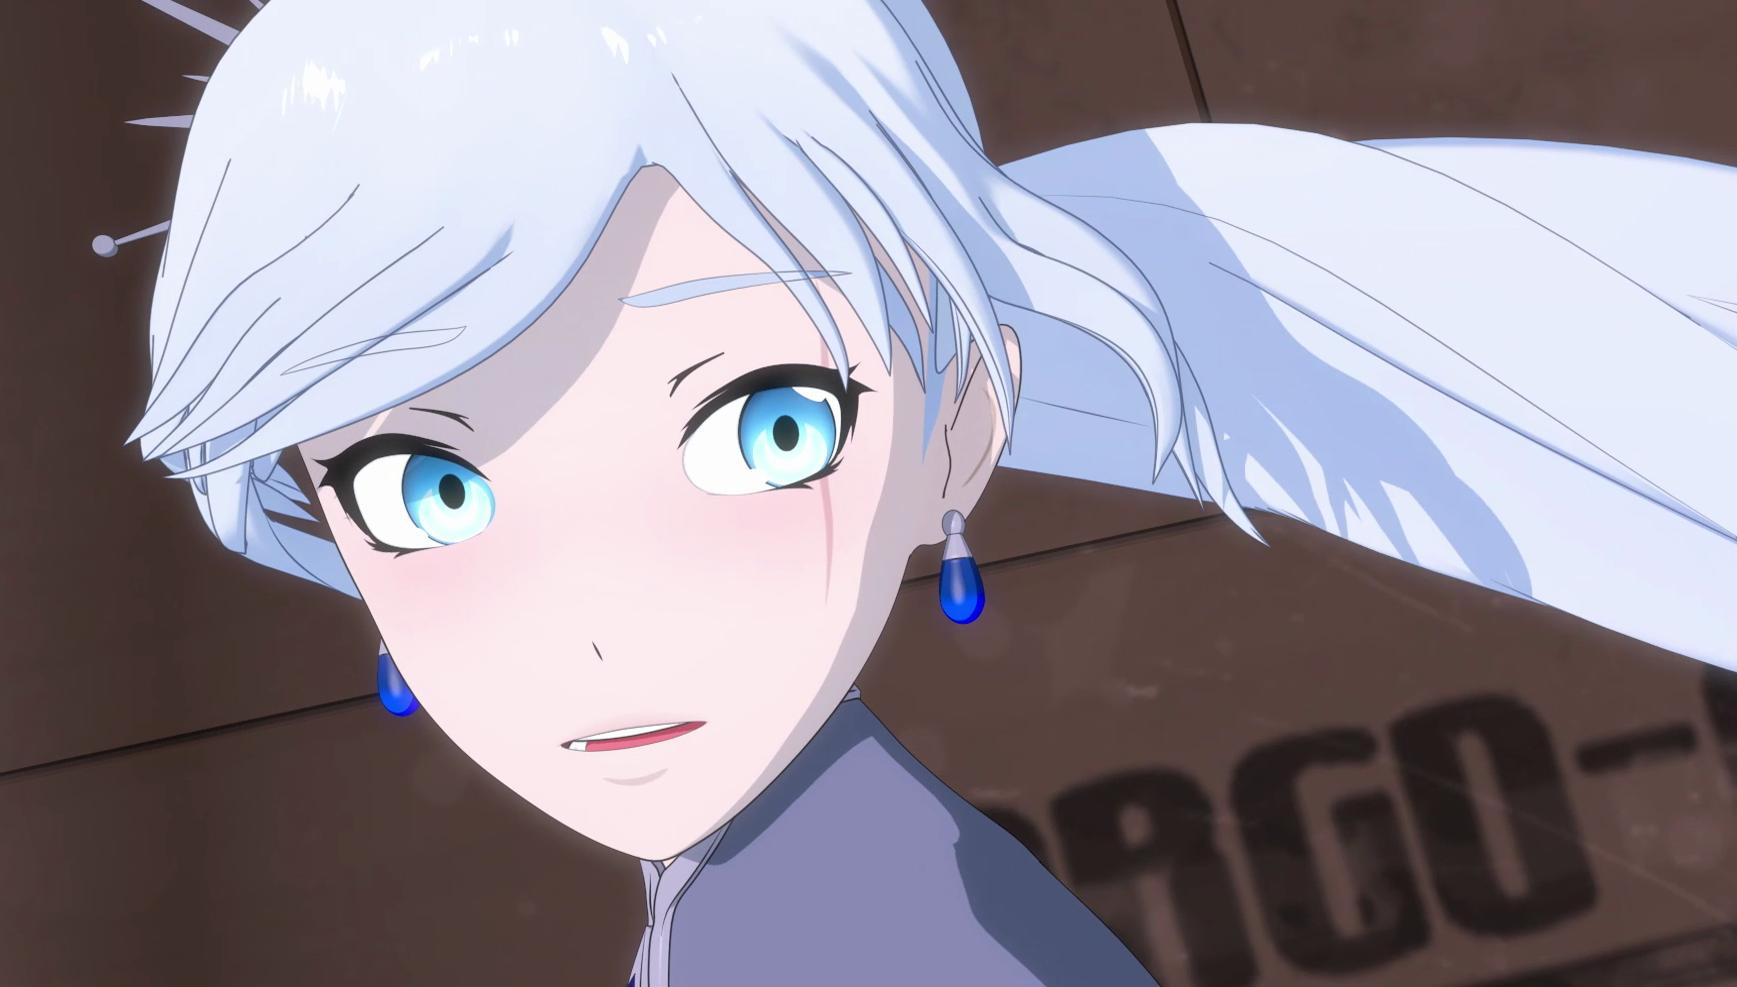 Rwby Volume 5 Vlc Screenshots Antdagamer Adg Anime News 13